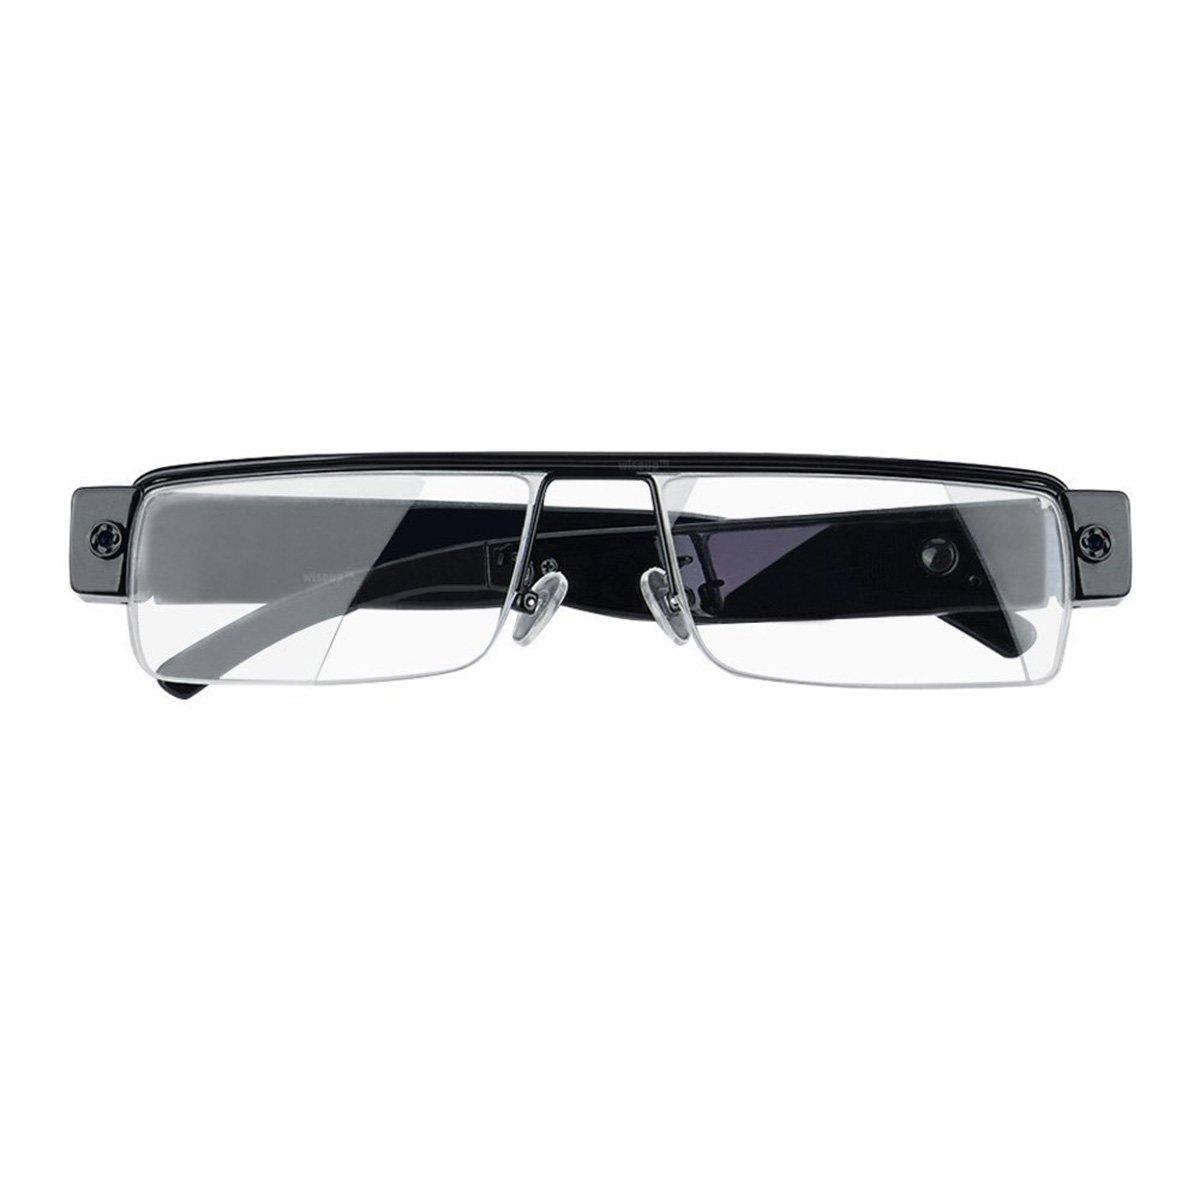 9e4e7689974 Amazon.com  Spy Camera Glasses 1080p Support Up to 32GB TF Card Fashion  Camera Glasses with Video Portable Video Recorder  Electronics